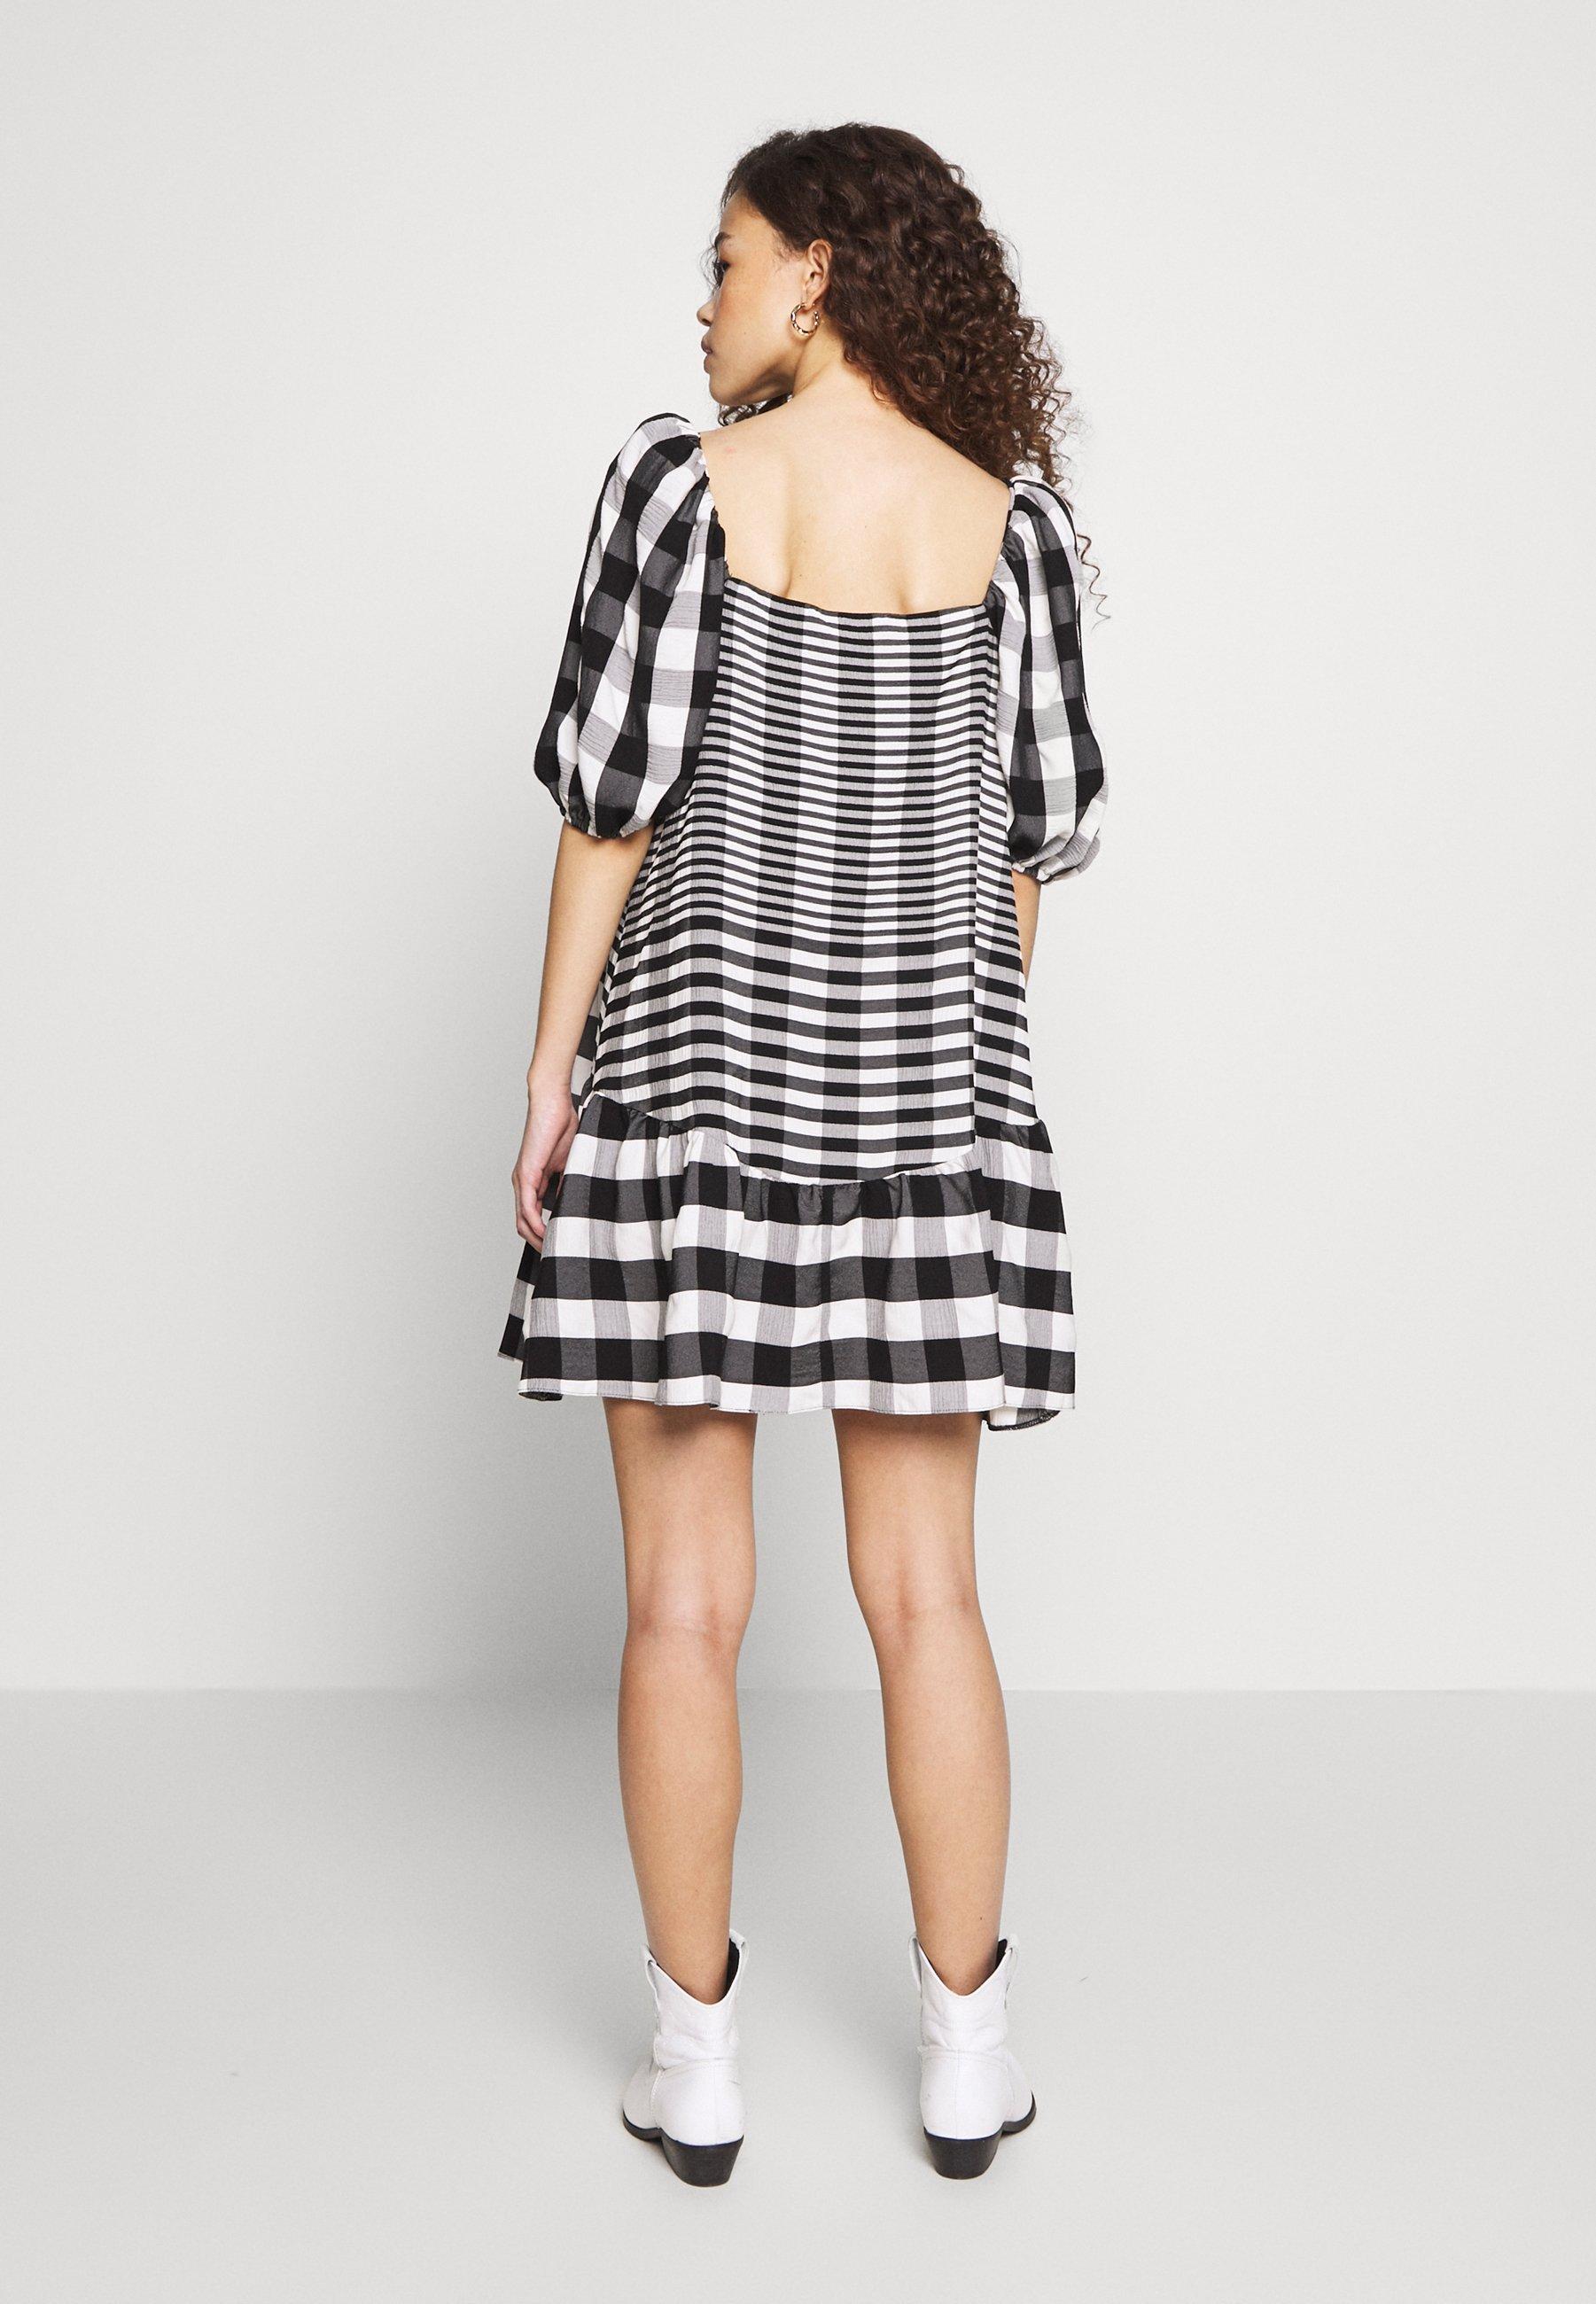 Topshop Petite Midi Textured Check - Day Dress Mono UK